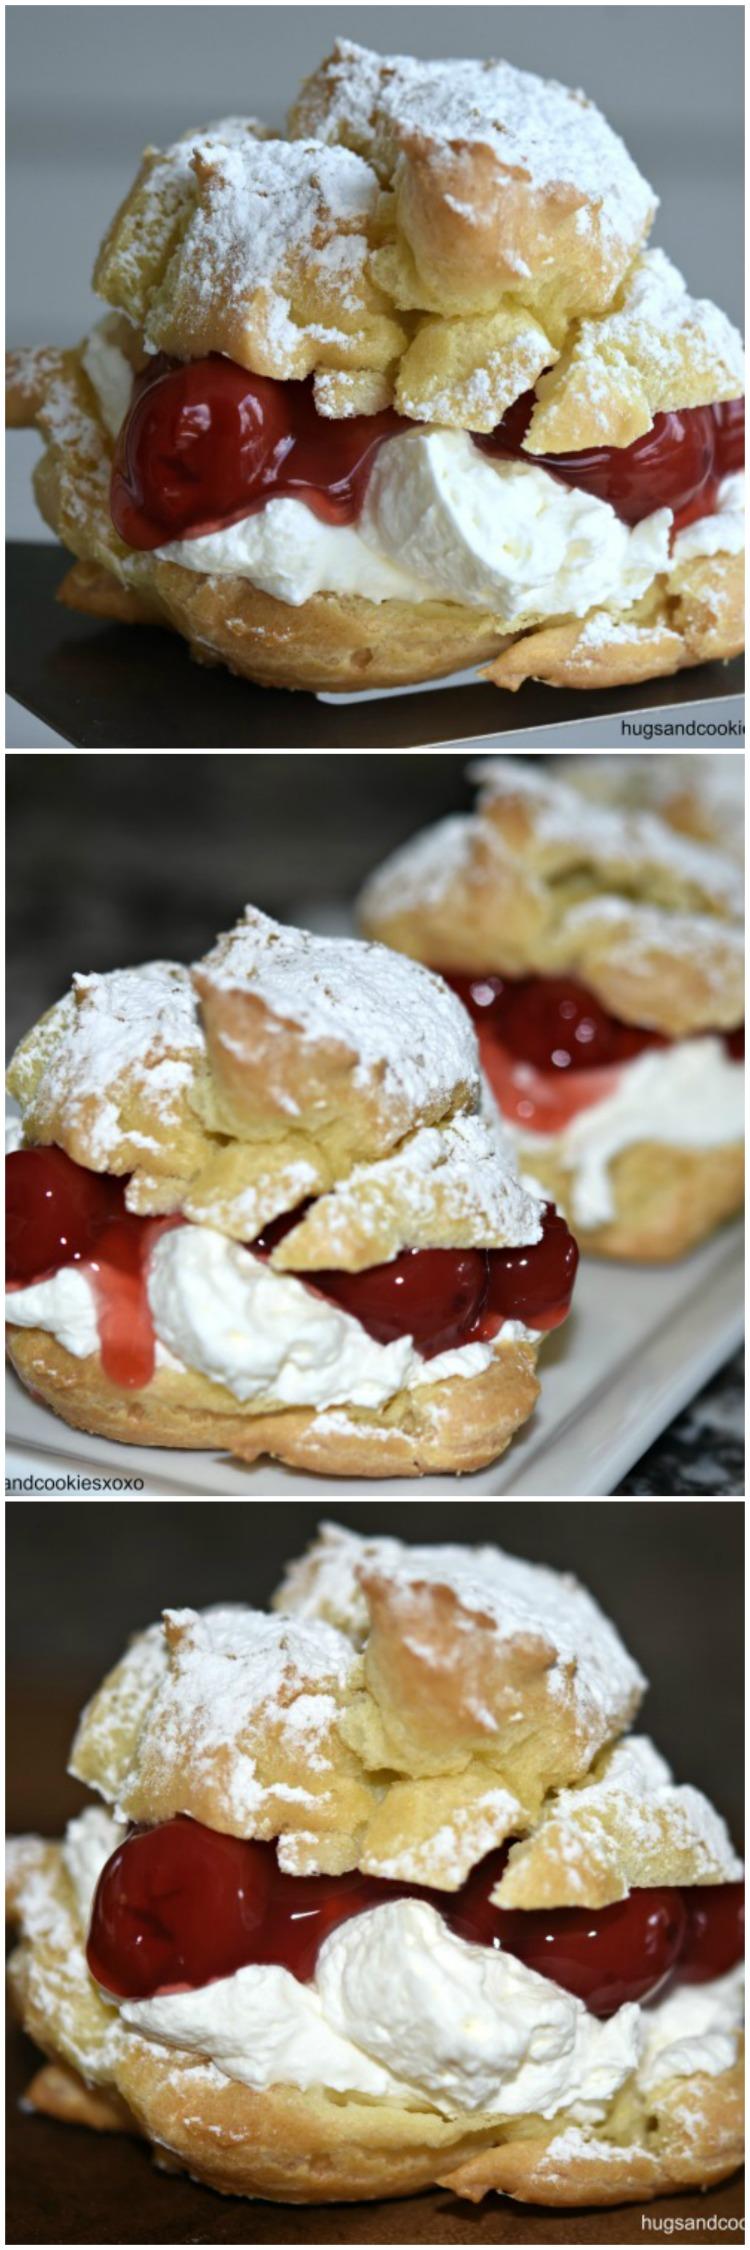 Cream Puffs with Cherries and Mascarpone Whipped Cream